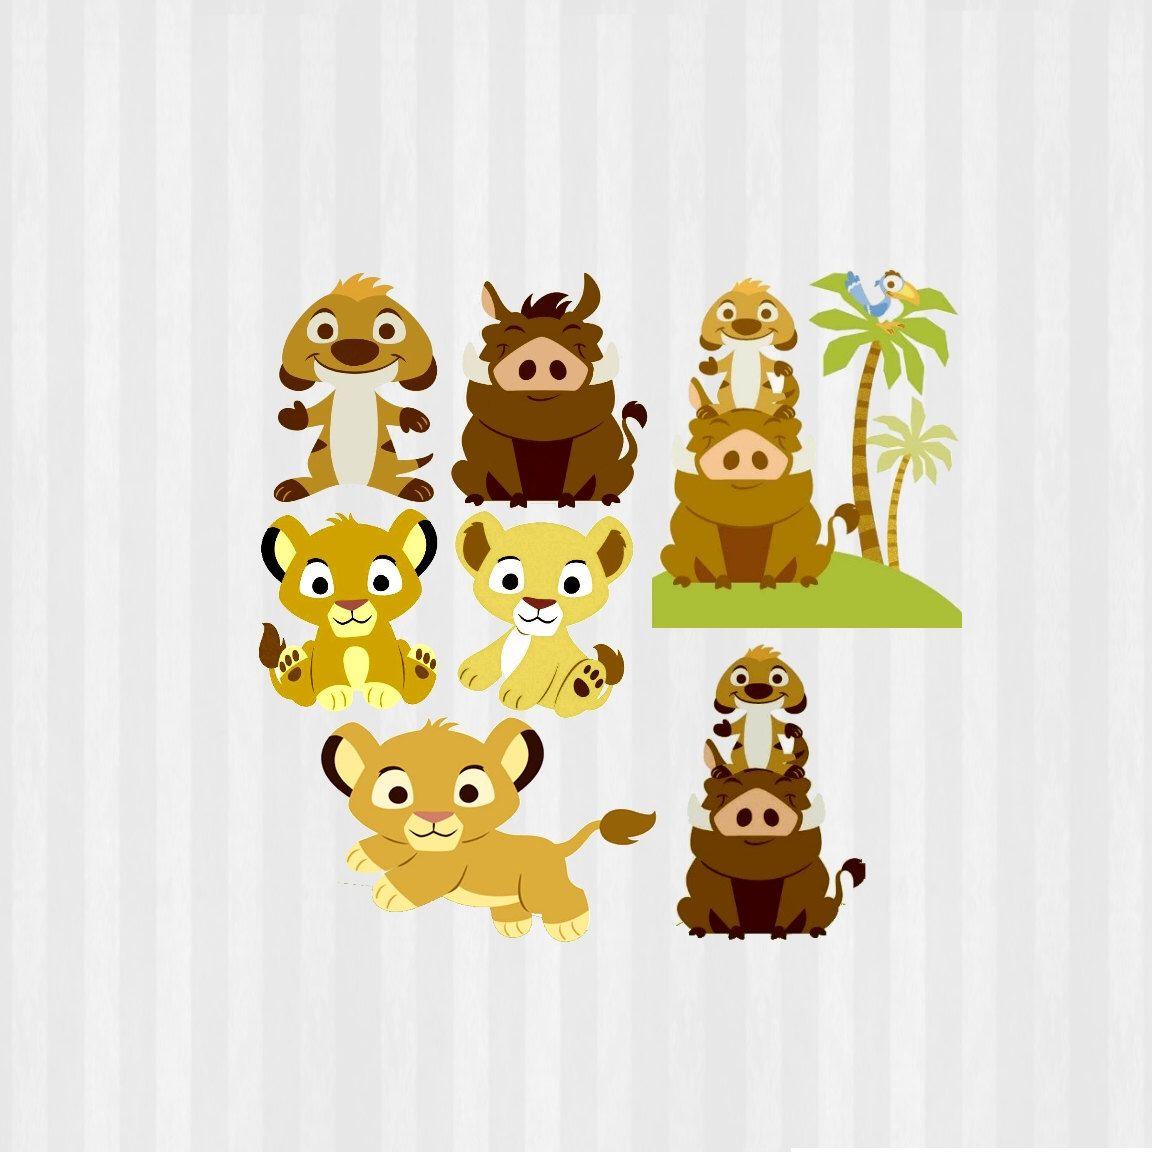 Bebé León rey Clip art, SVG Baby Lion King, Rey León baby shower ...